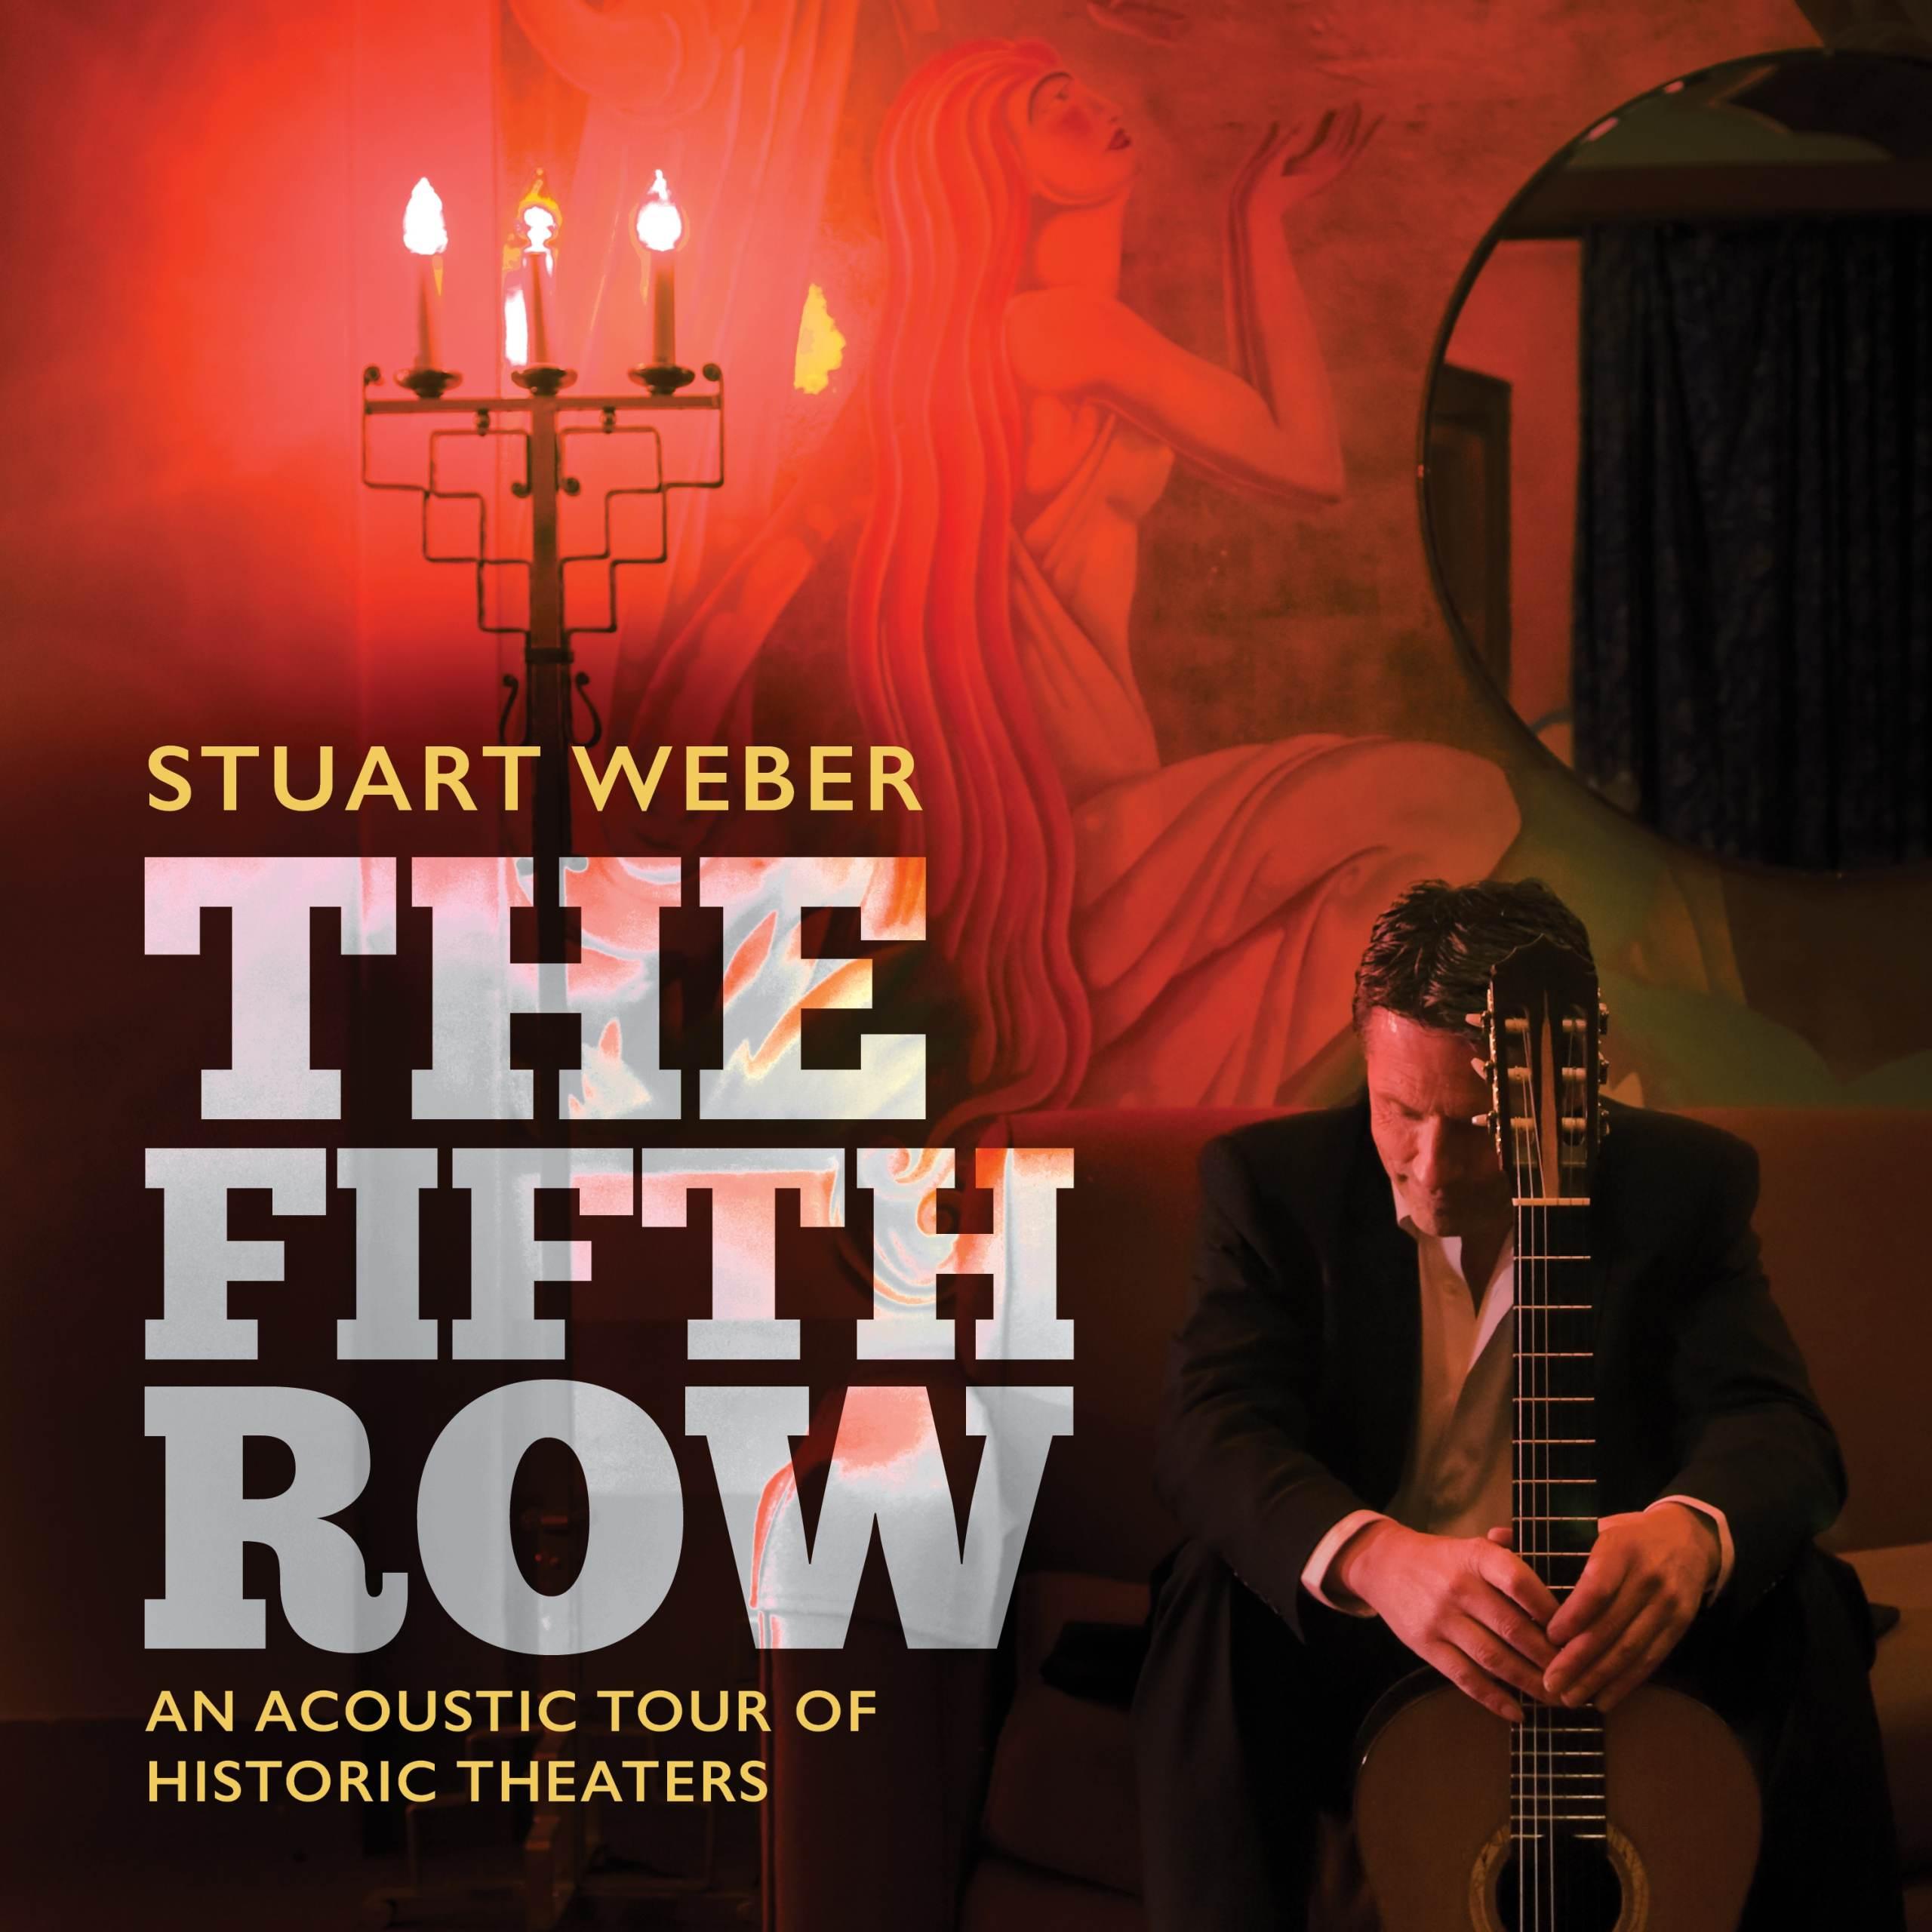 THE FIFTH ROW - Stuart Weber - album cover